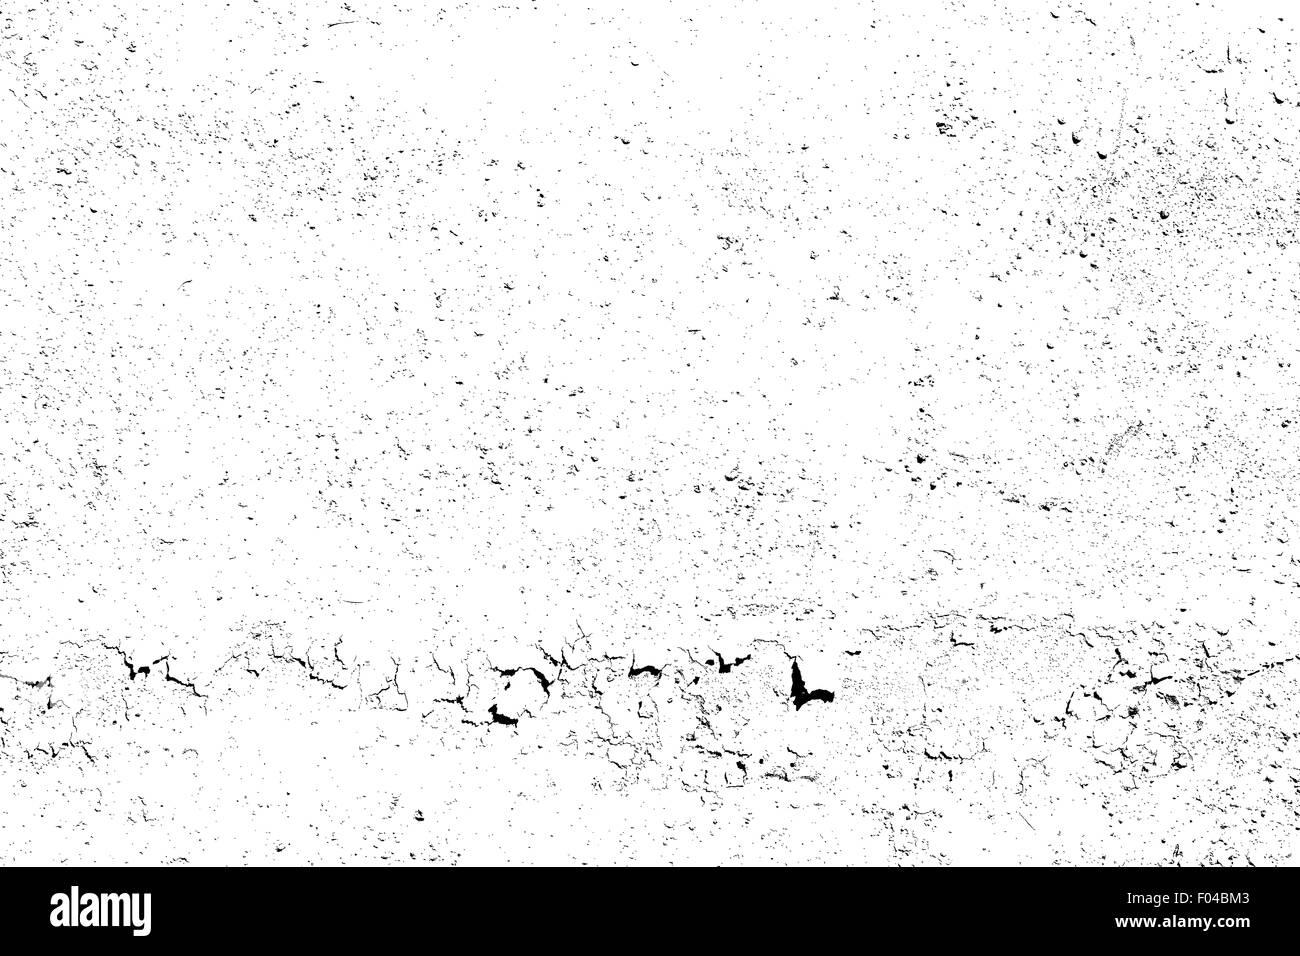 Distress Background - Stock Image